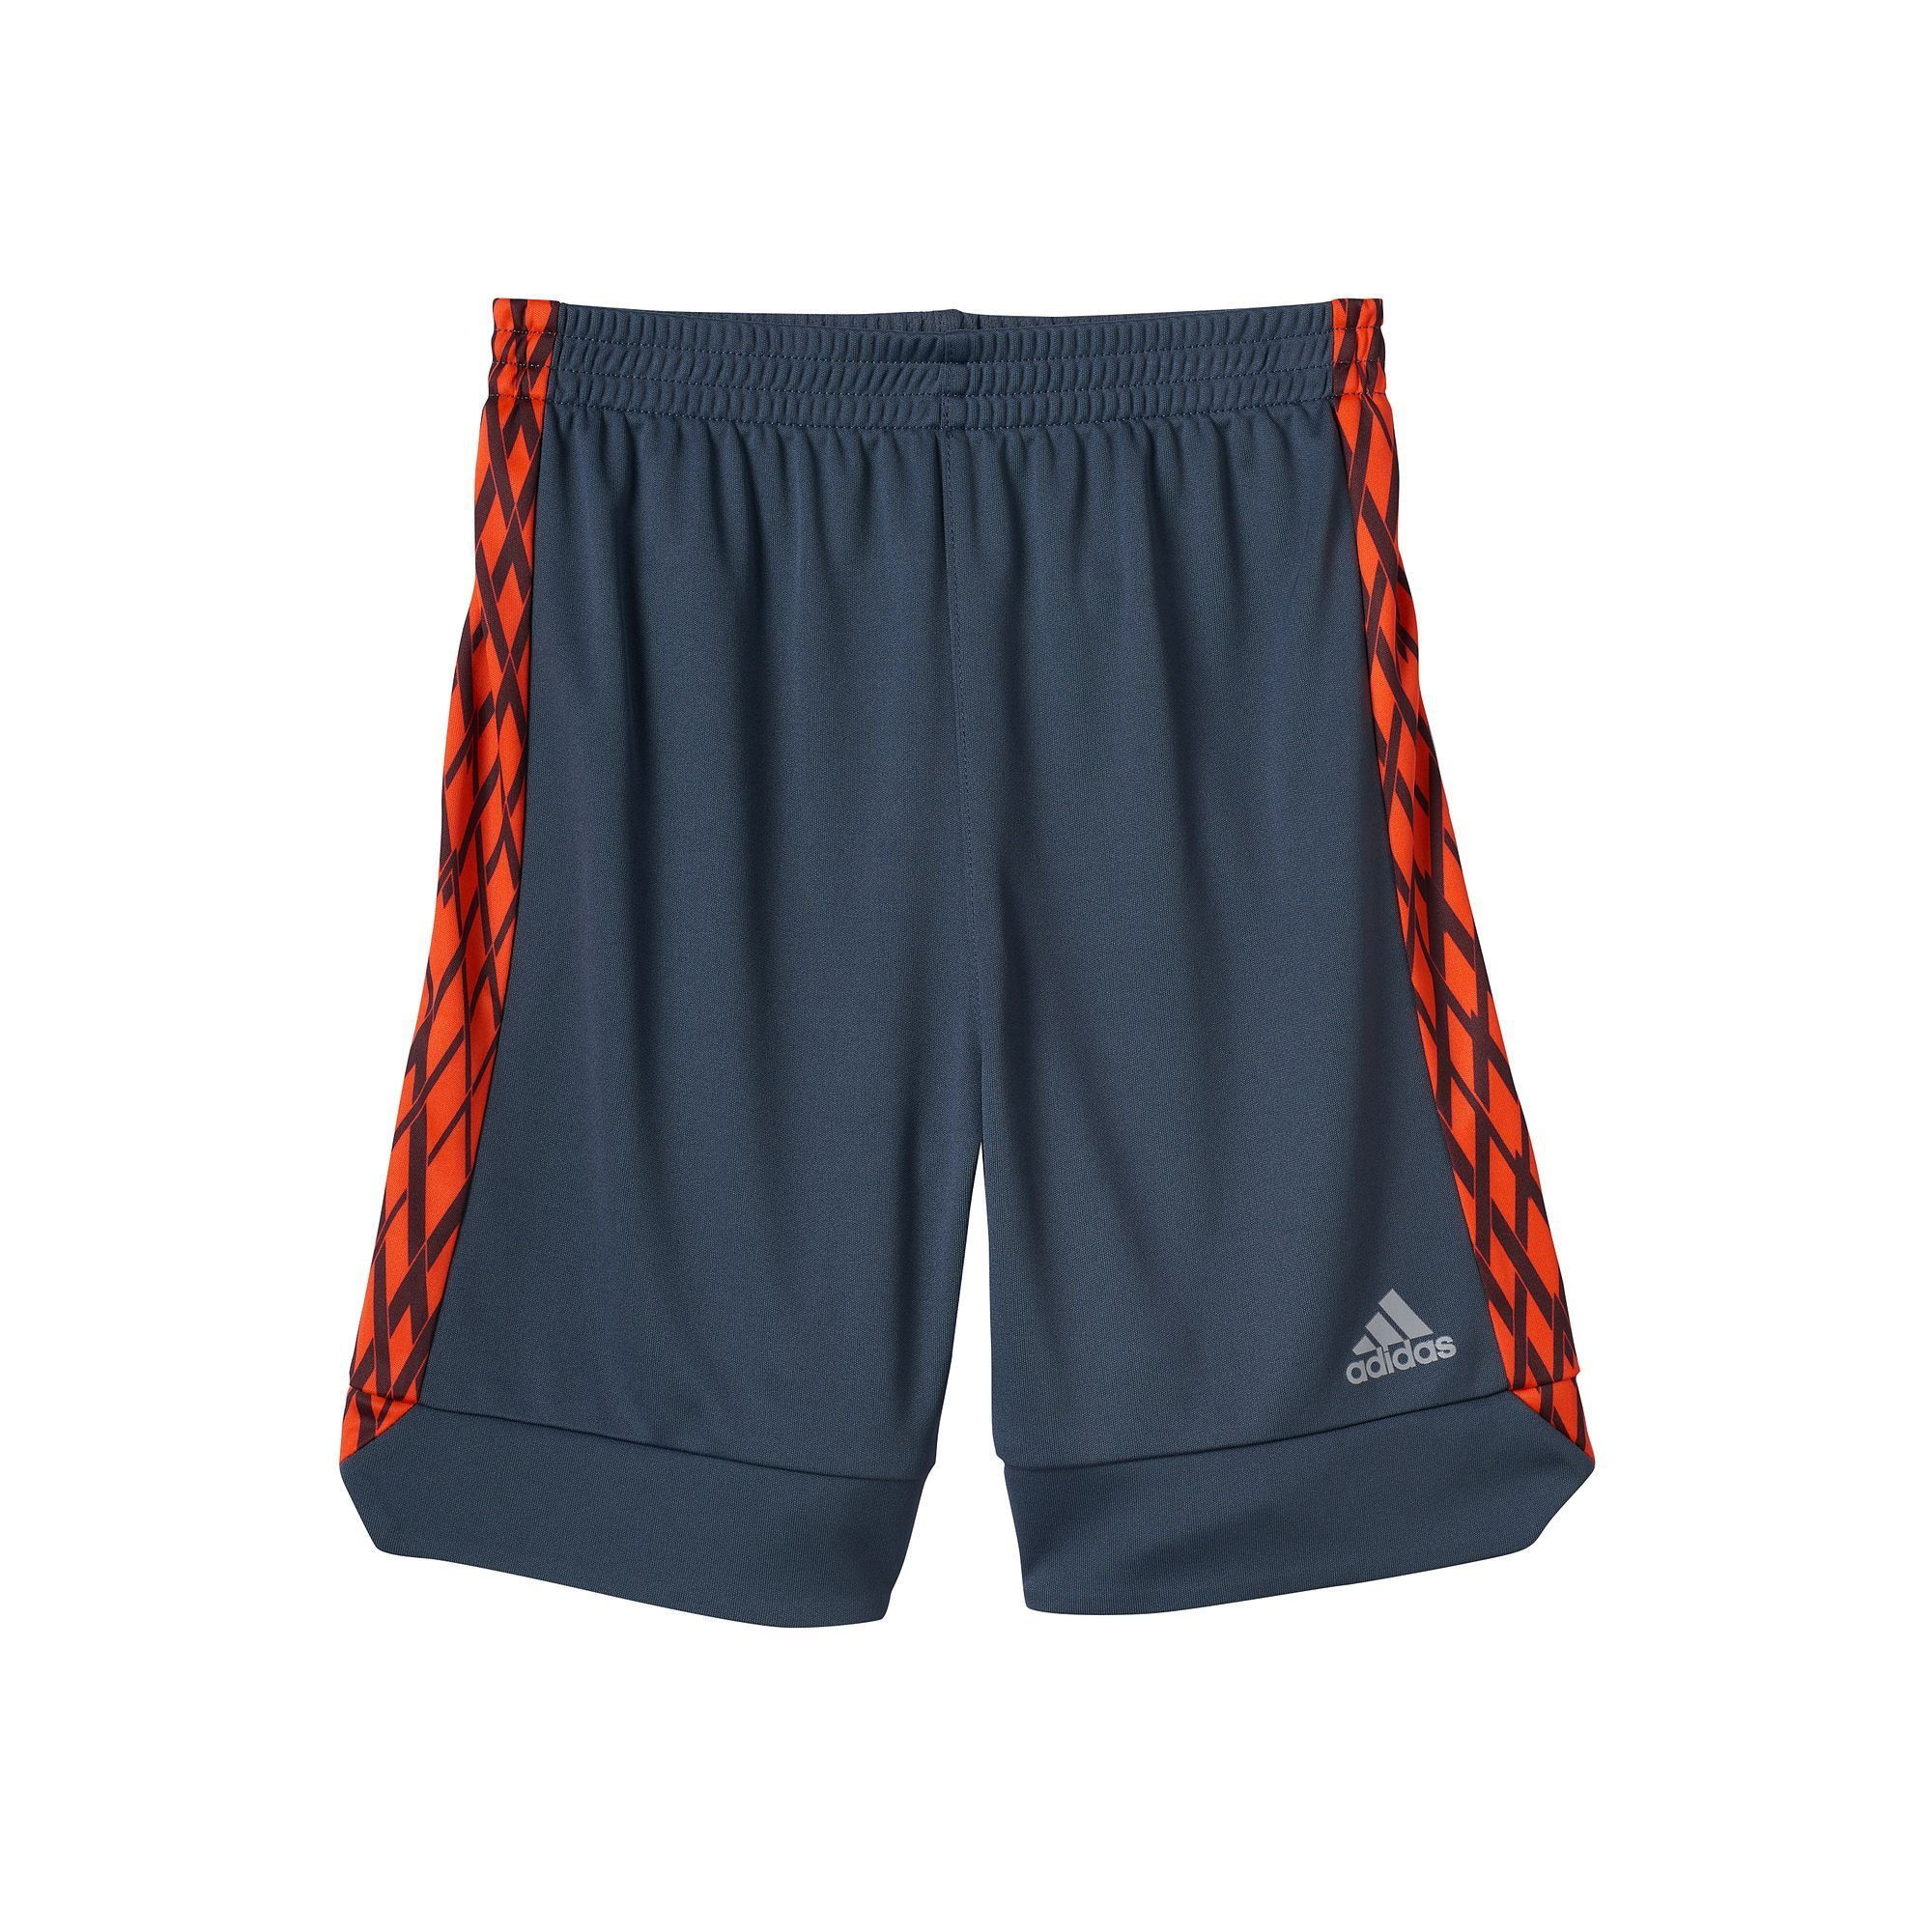 Boys 4-7x adidas Climalite Net Print Athletic Shorts